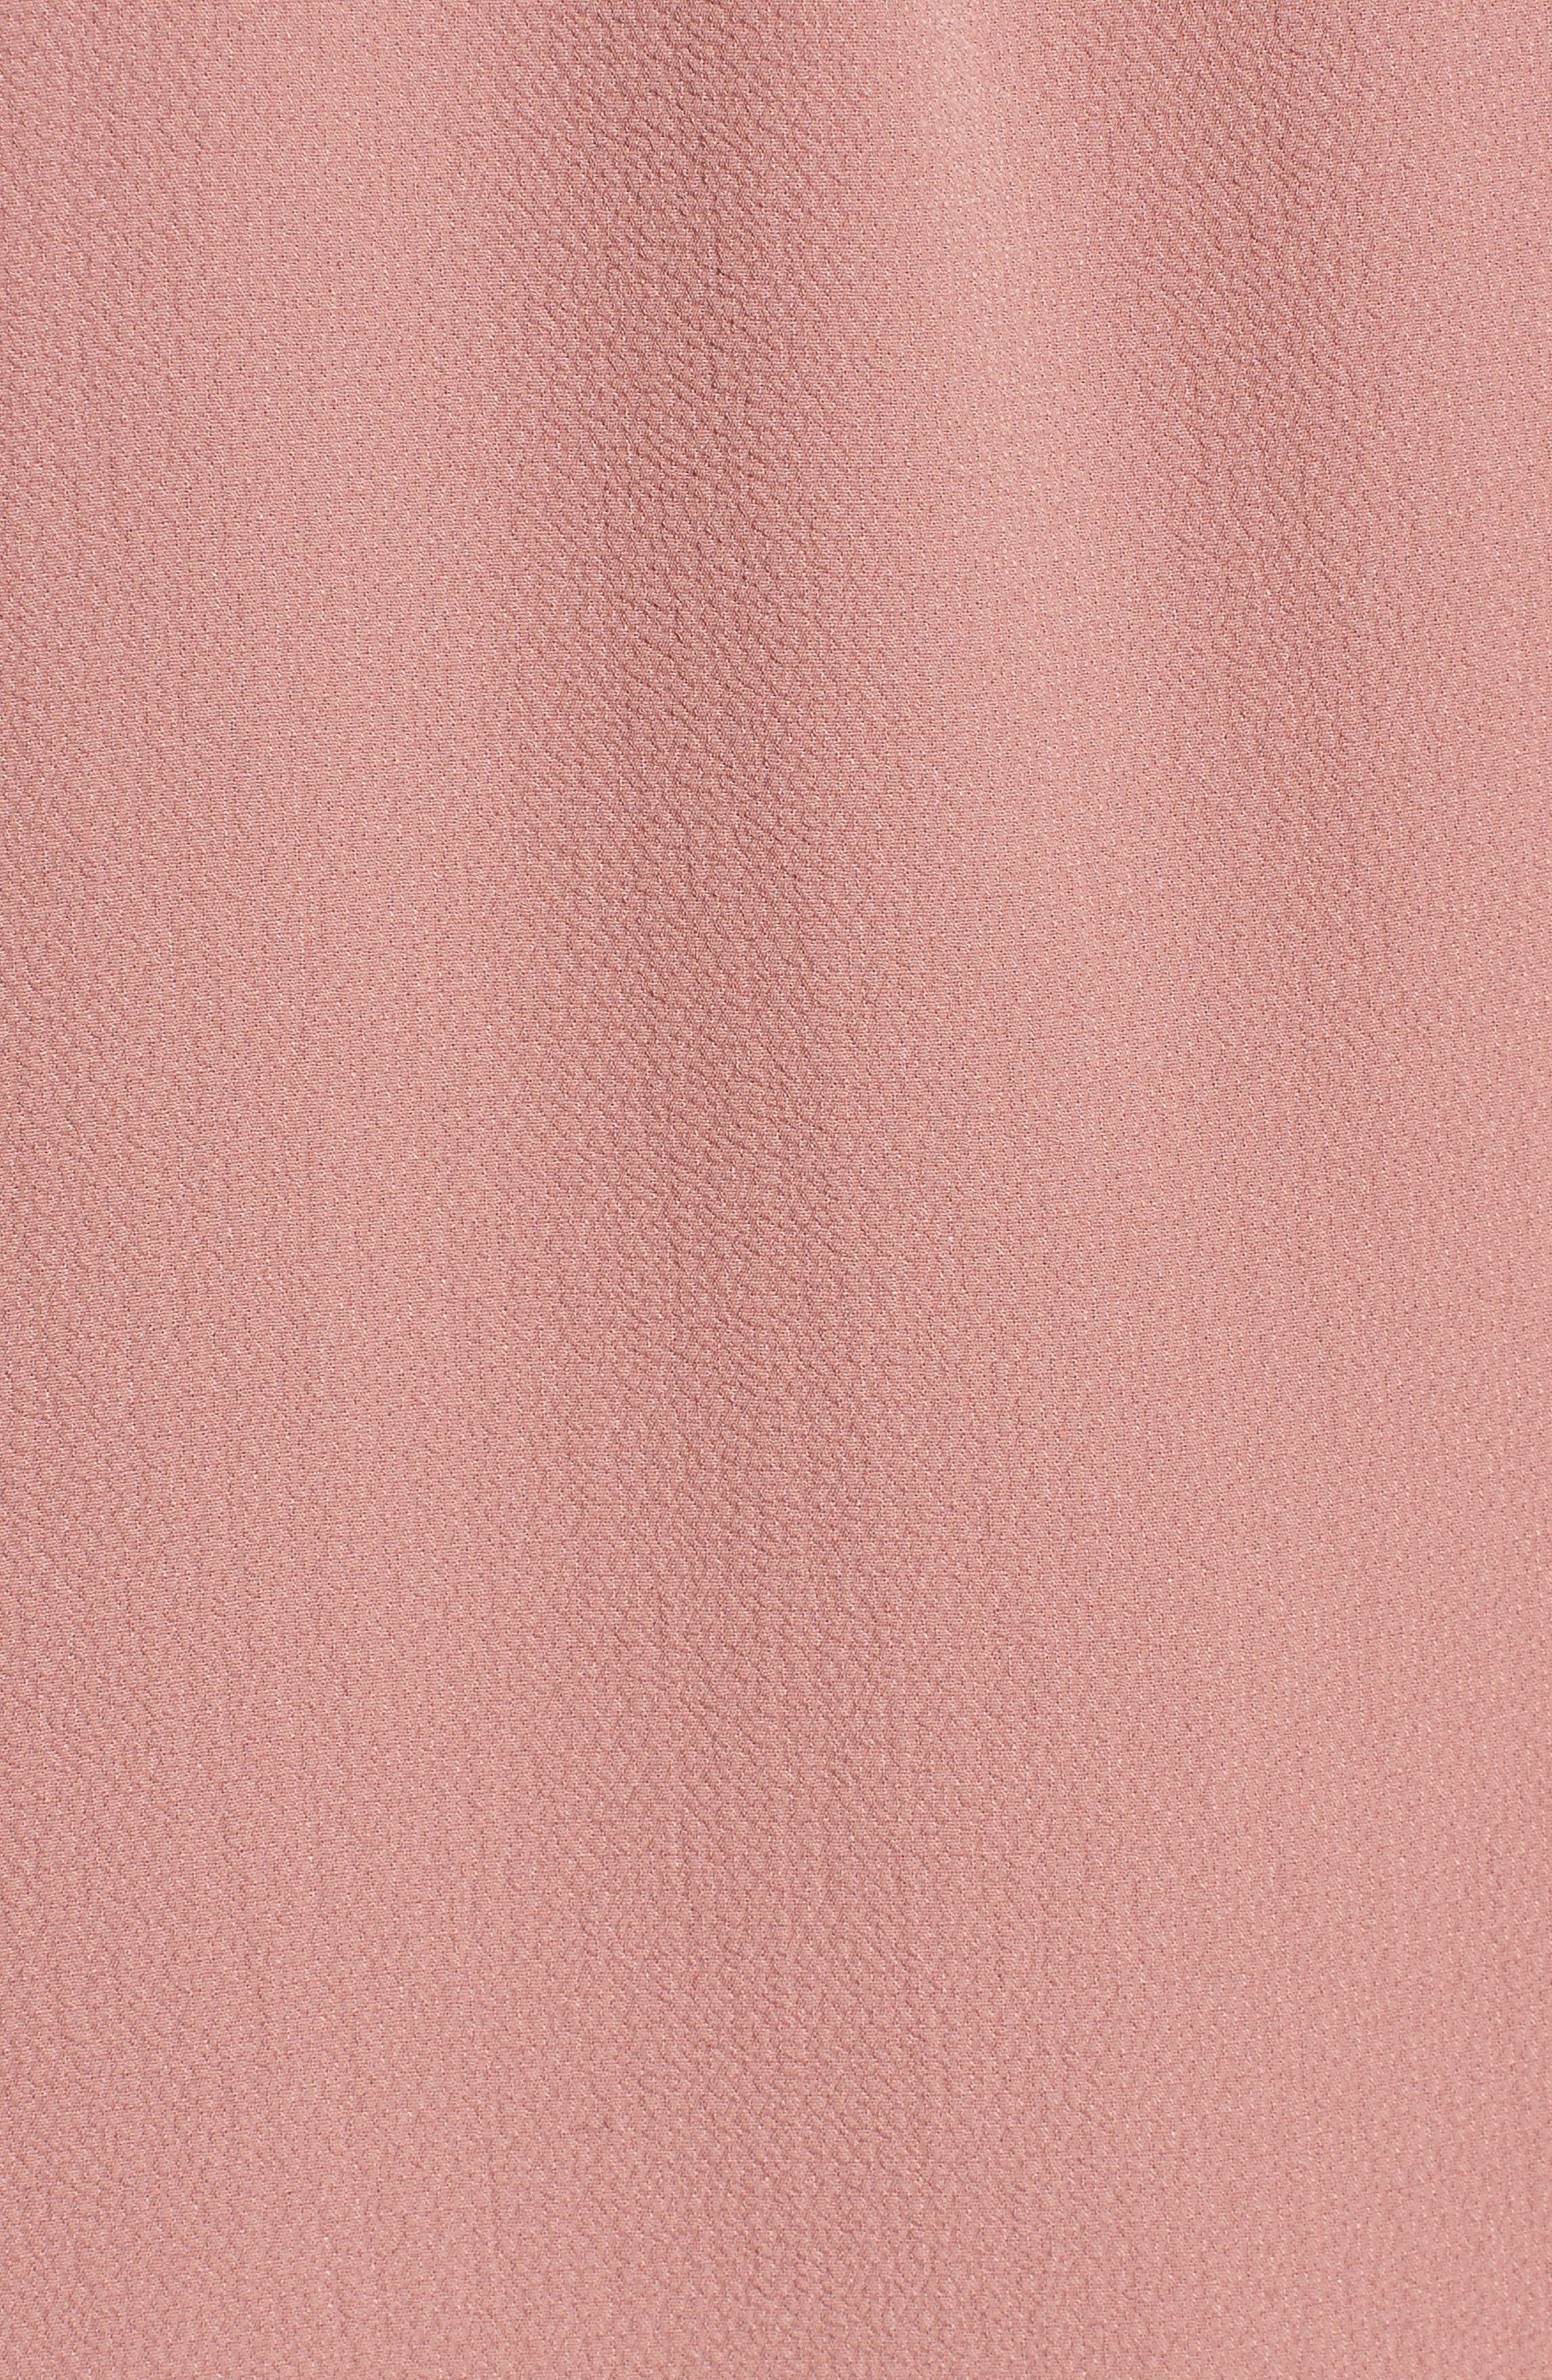 Bell Sleeve Off the Shoulder Shift Dress,                             Alternate thumbnail 5, color,                             Mauve